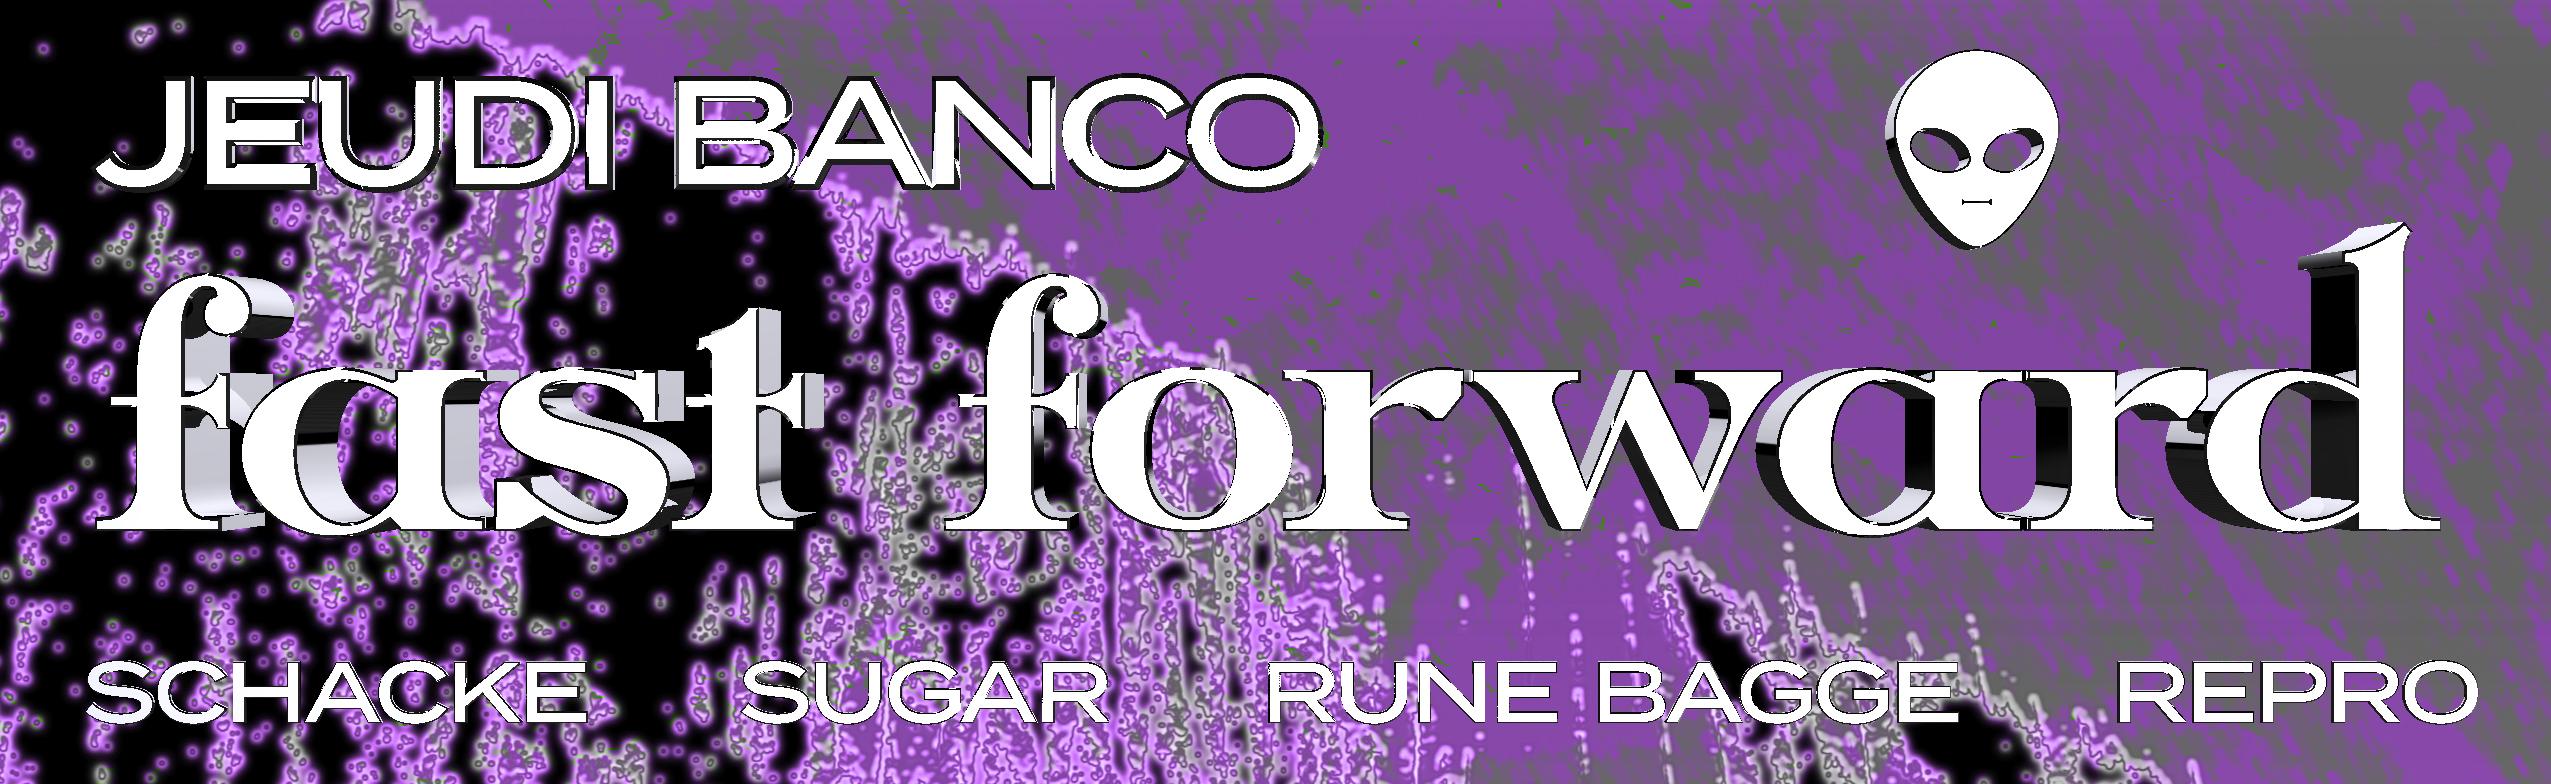 Jeudi Banco x Fast Forward : Repro • Schacke • Sugar • Rune Bagge